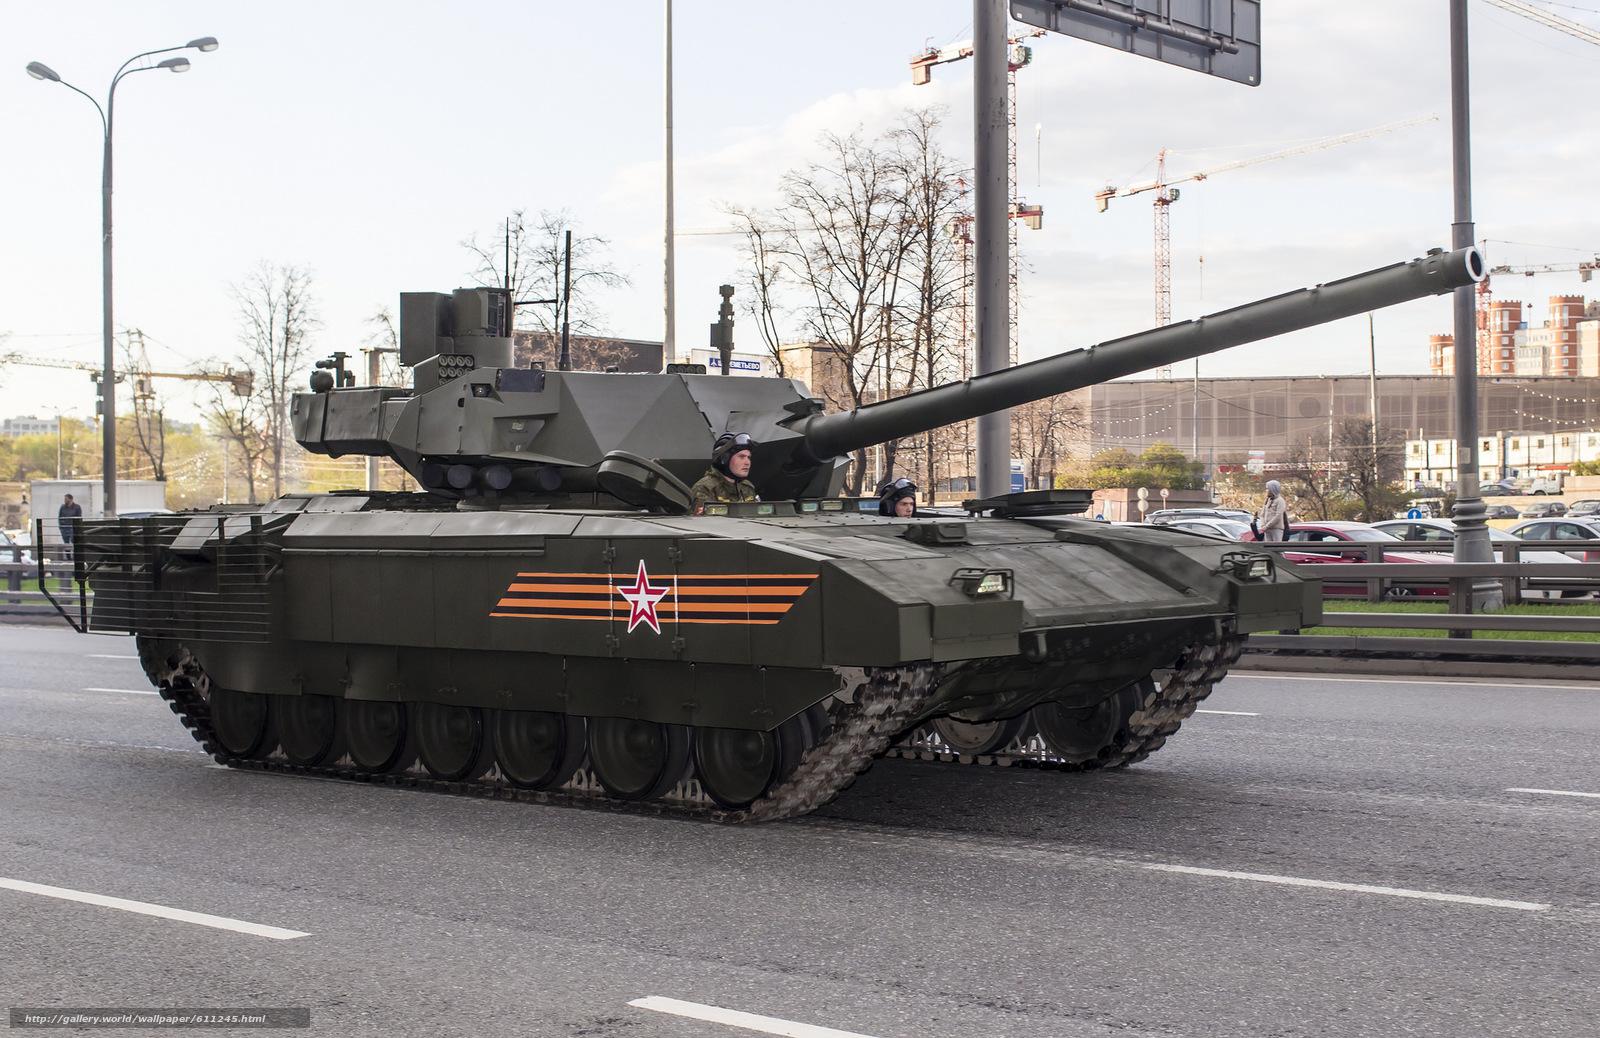 танк, армата, т-14, бронетехника, оружие, армия